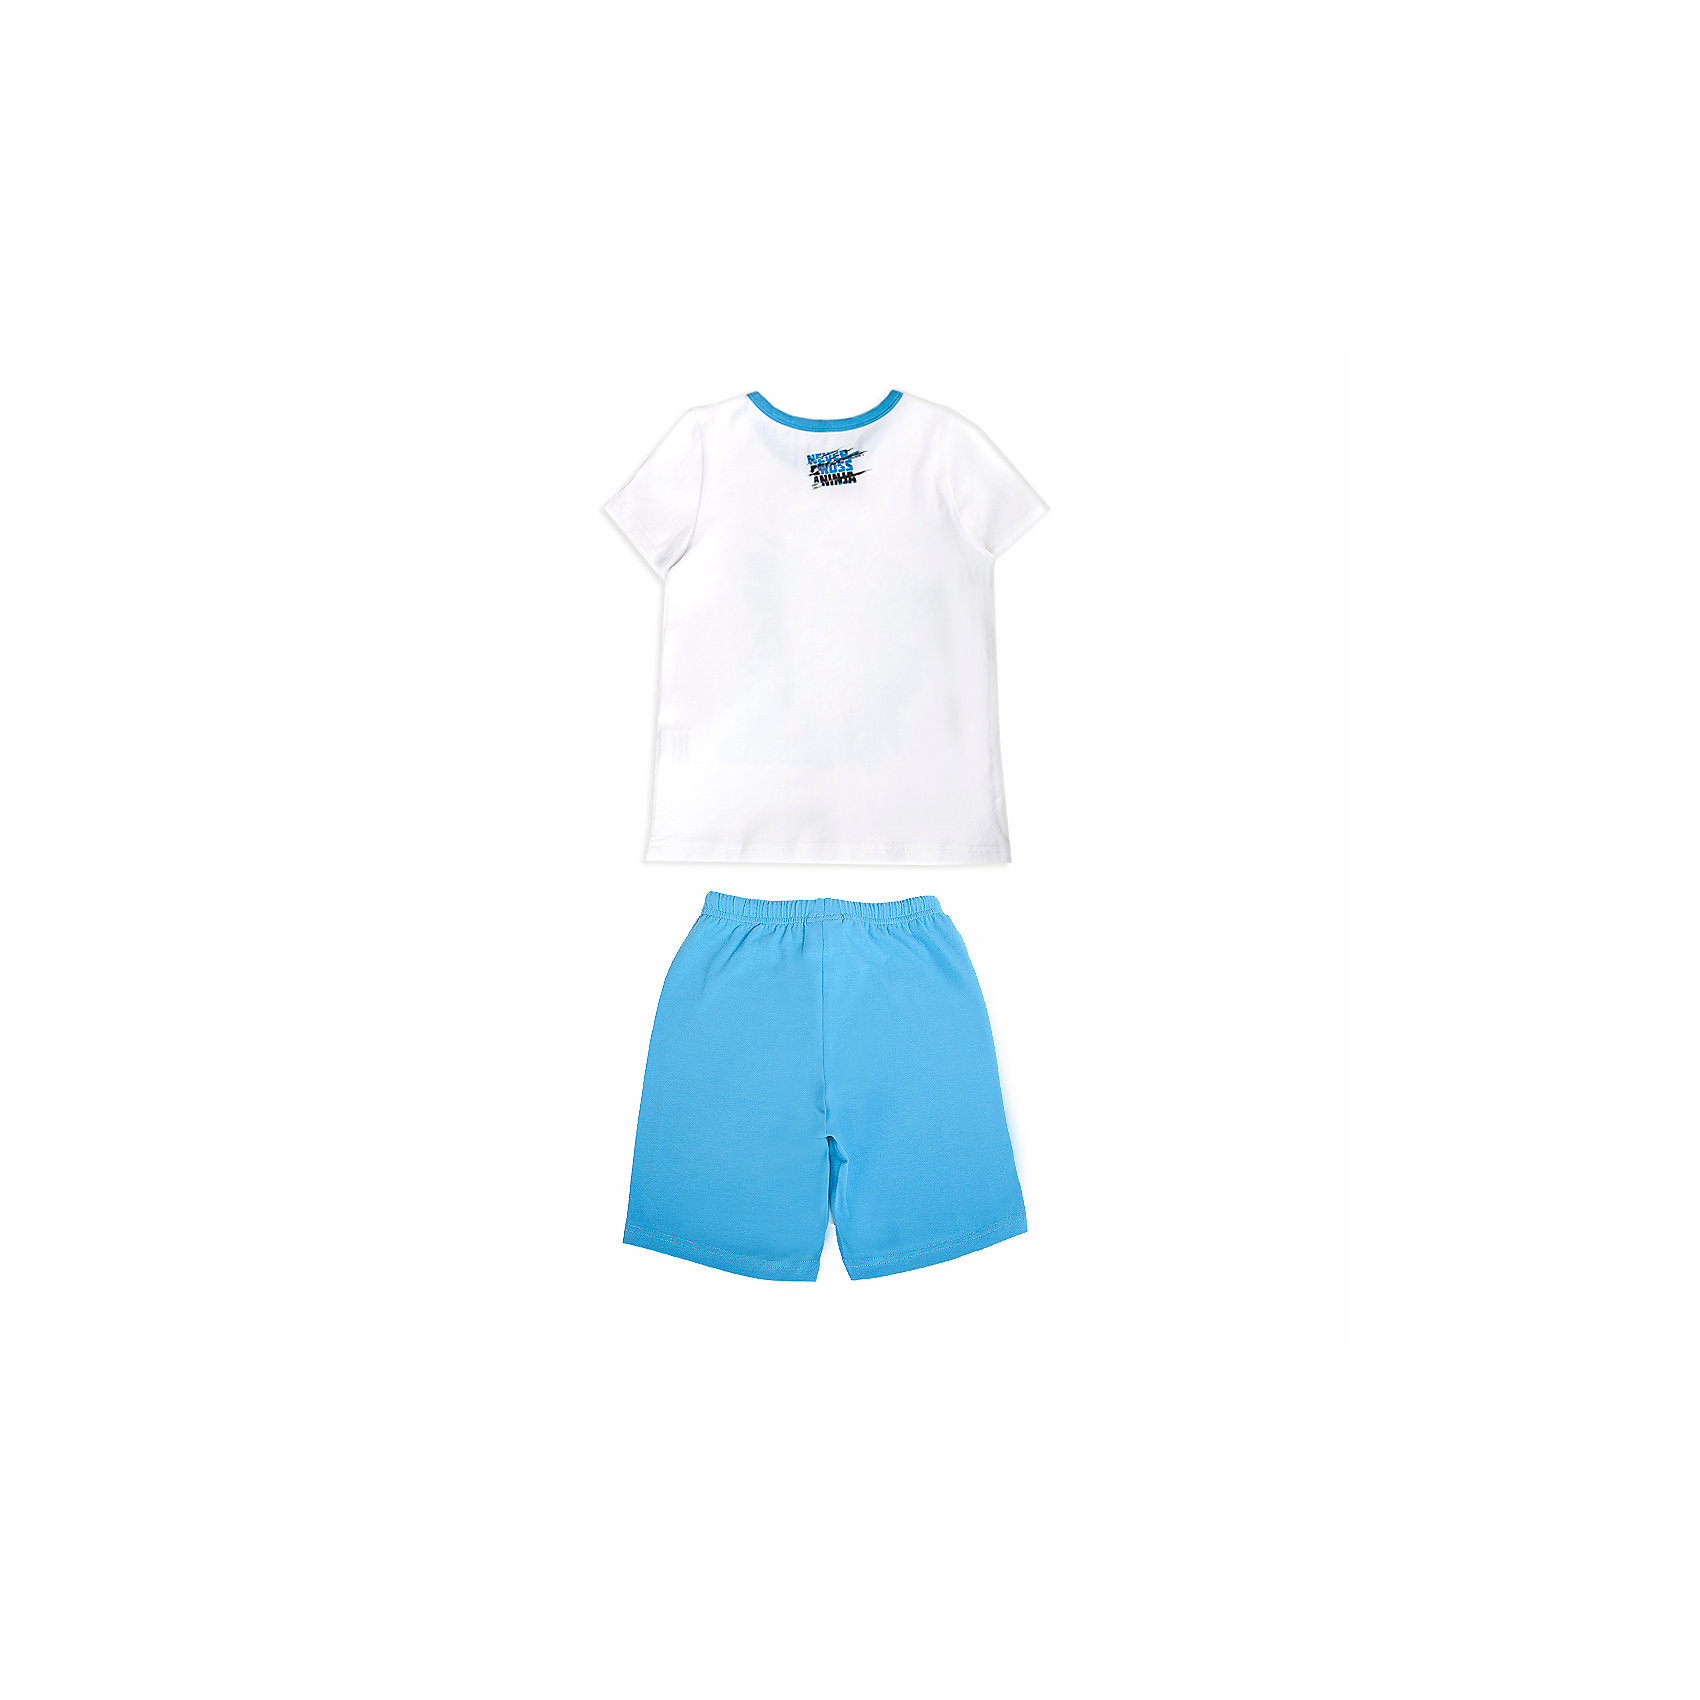 Пижама для мальчика Черепашки ниндзя от myToys